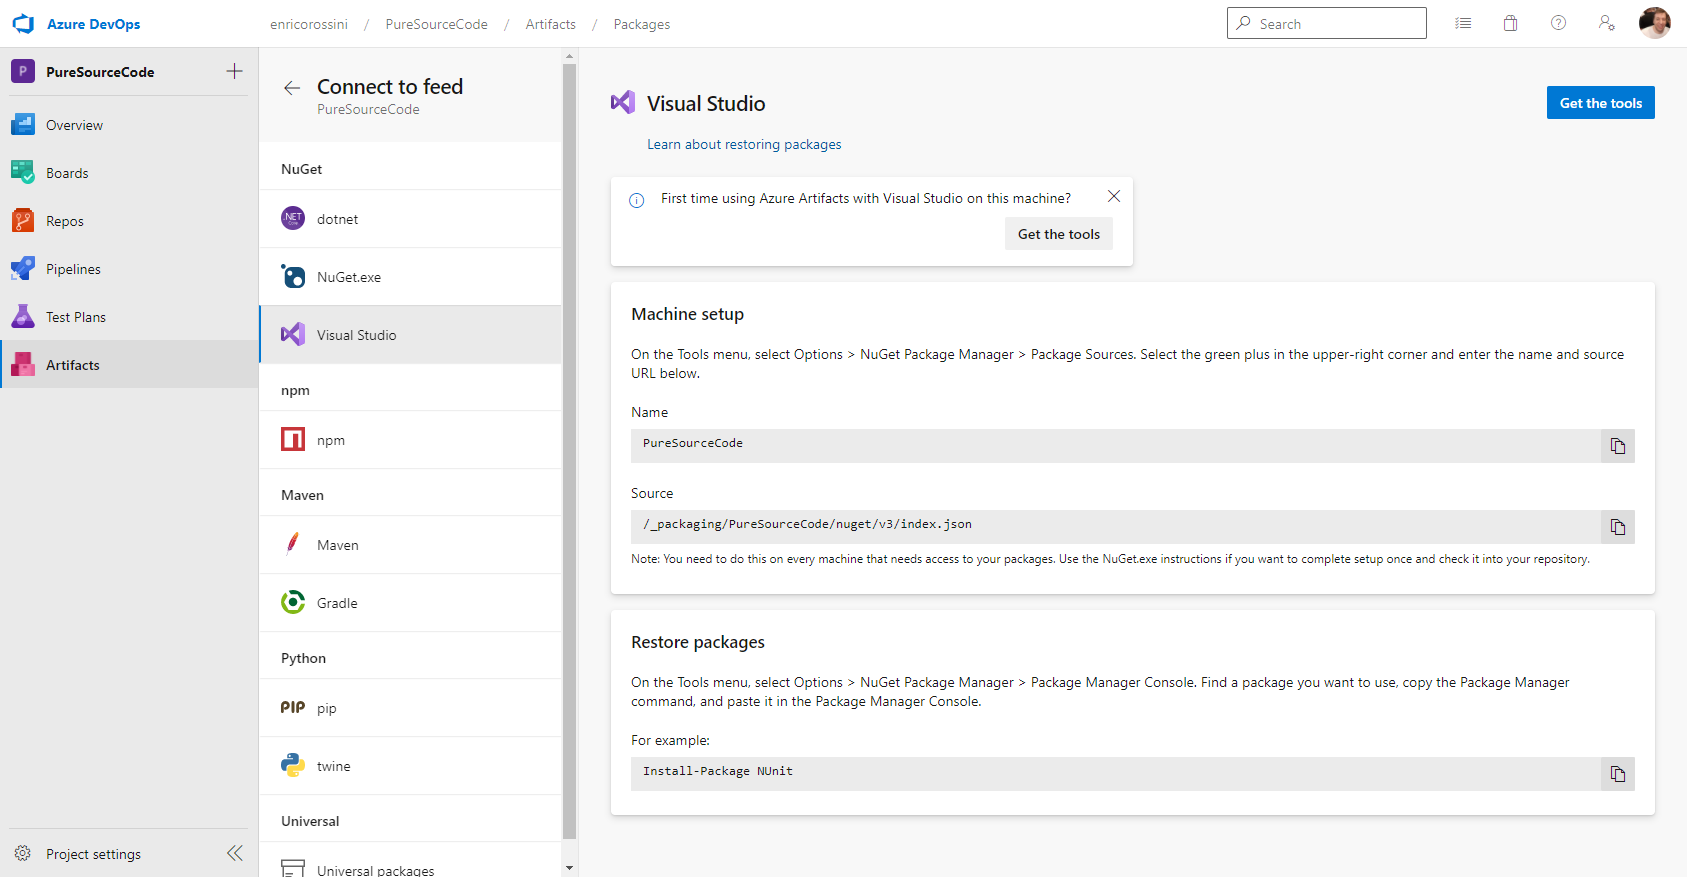 Visual Studio instructions